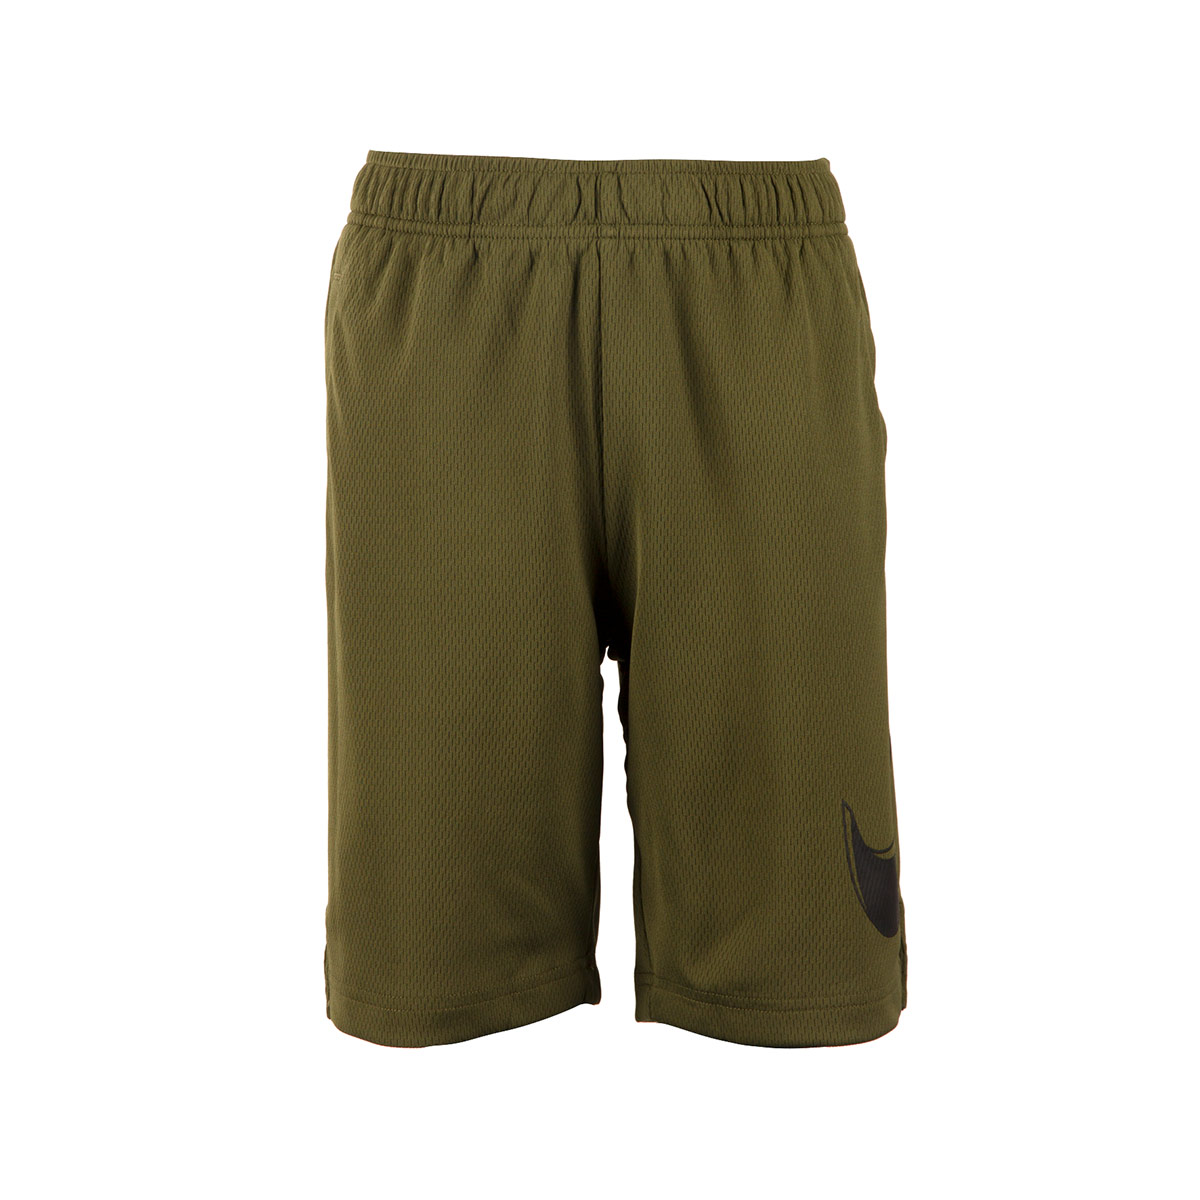 927dd24866e59 ... Nike Dri-Fit Shorts Olive Canvas Kids - Front 3 ...